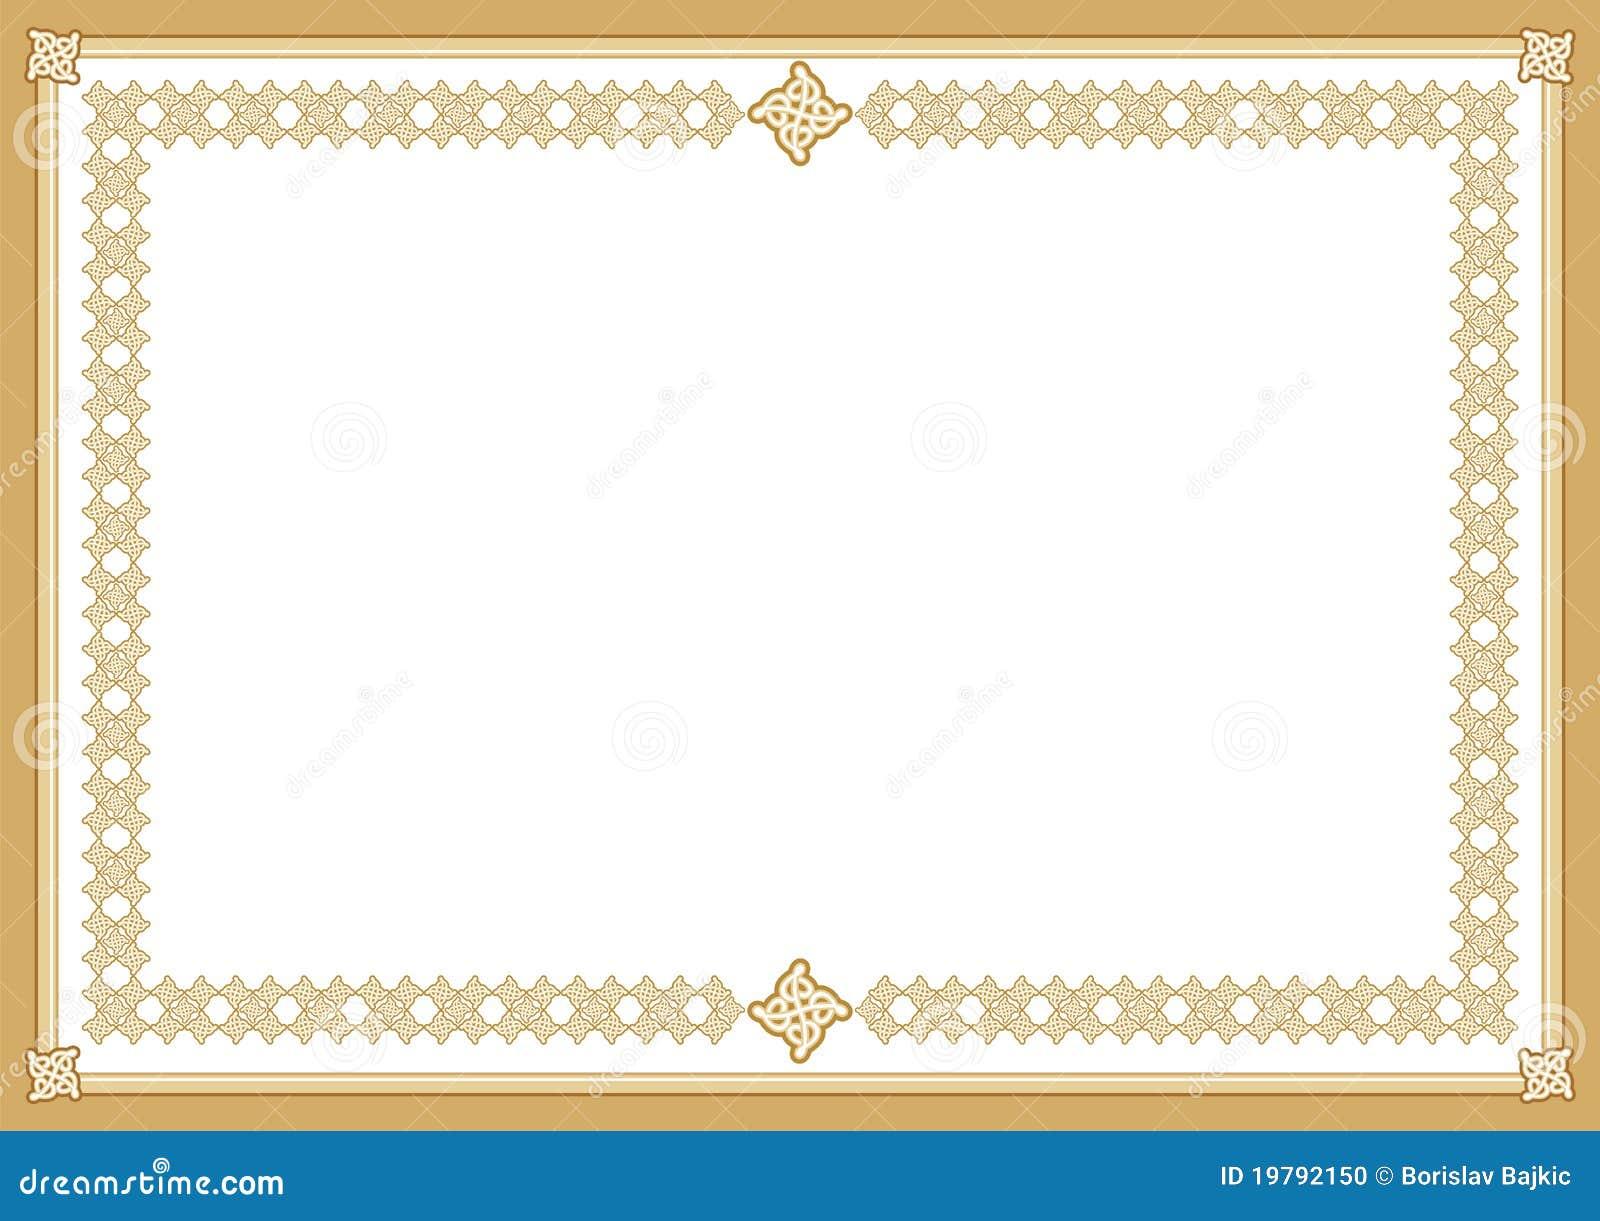 Floral certificate border vector download : Cindy-wii.tk